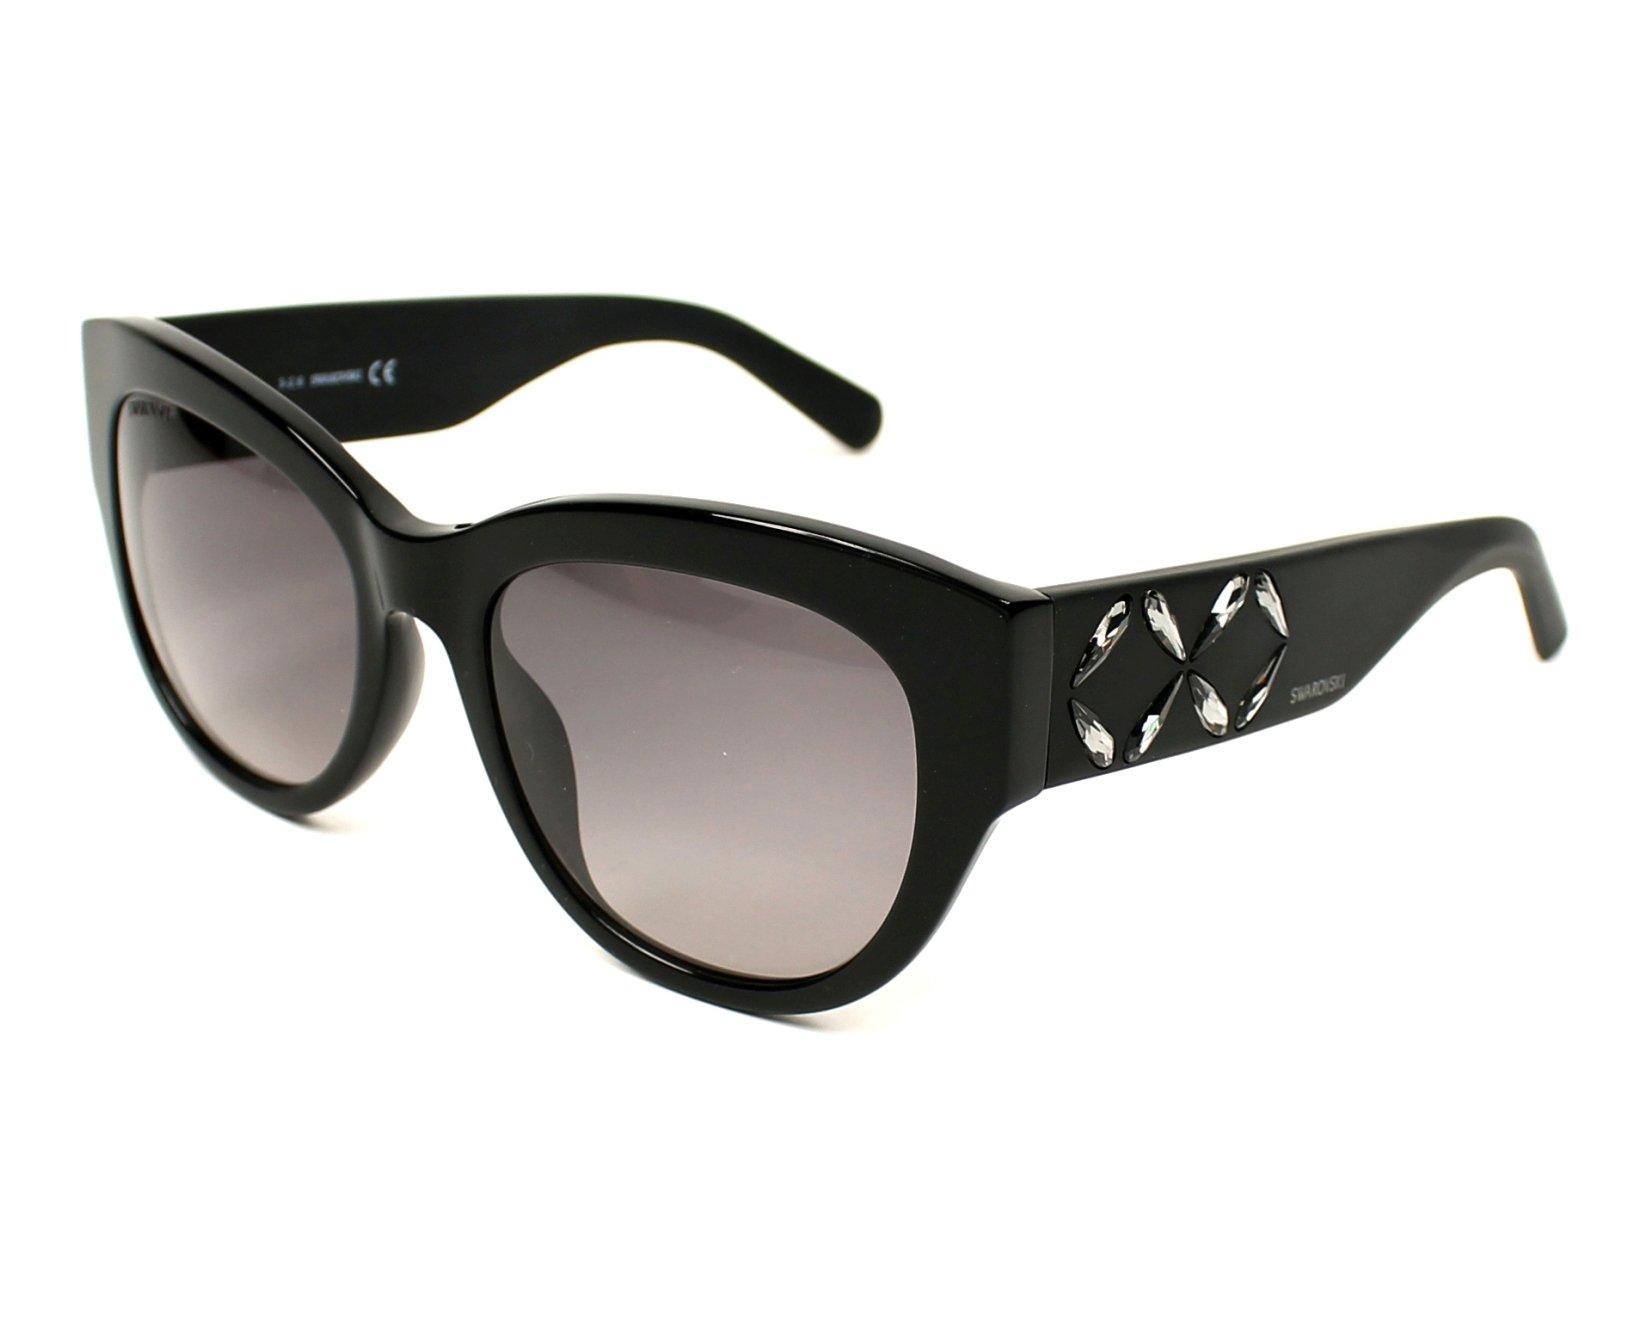 1b4259e824ac Swarovski - Buy Swarovski sunglasses online at low prices